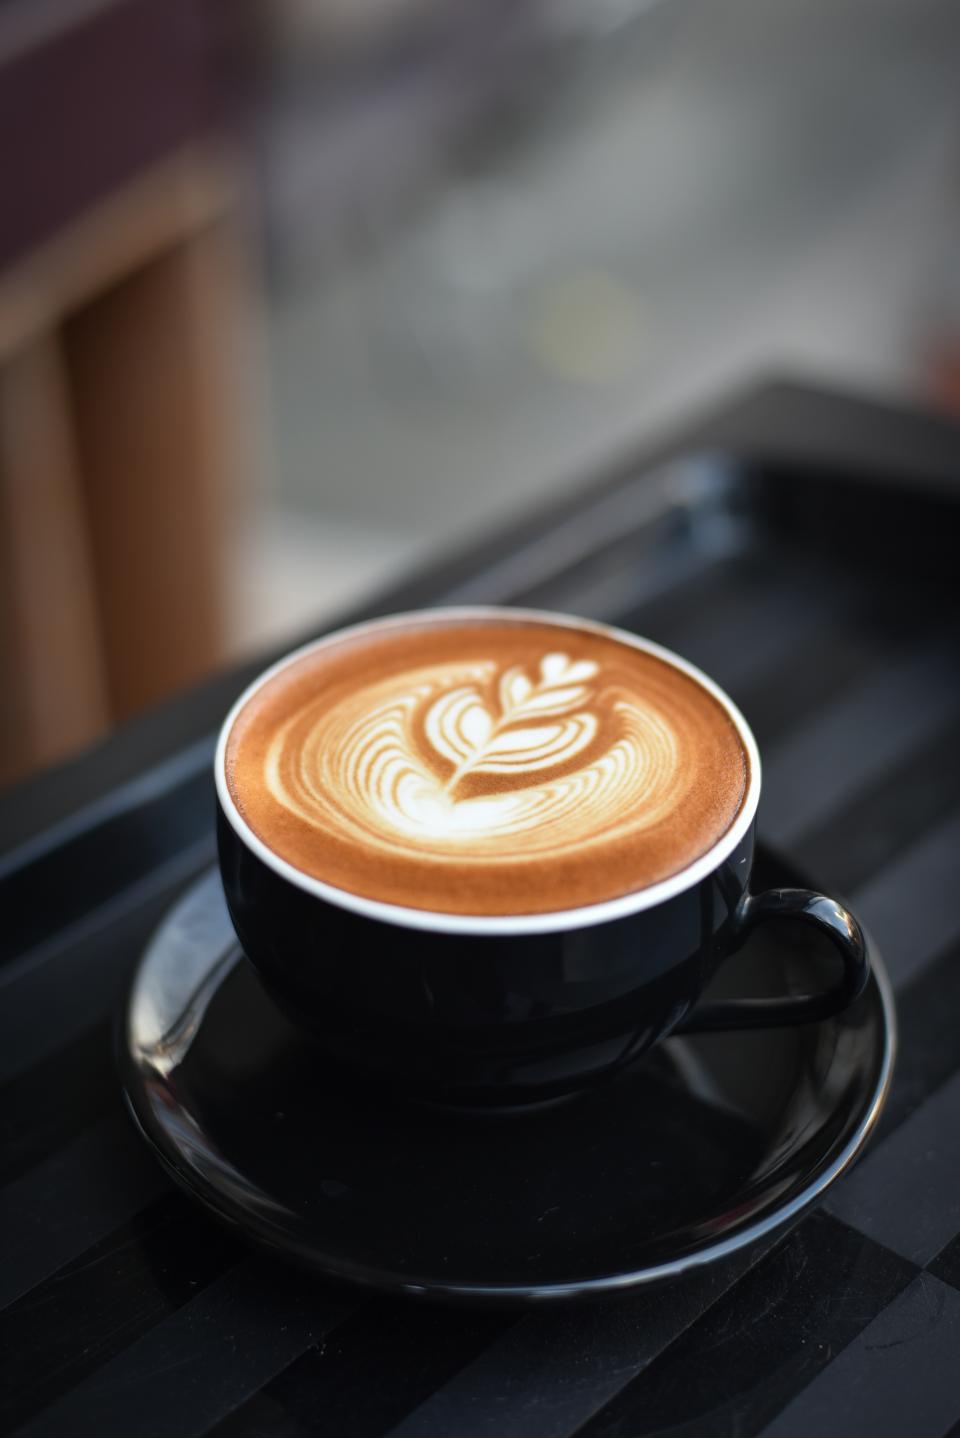 coffee, cafe, hot, mug, cup, white, coffeemaker, shop, restaurant, art, design